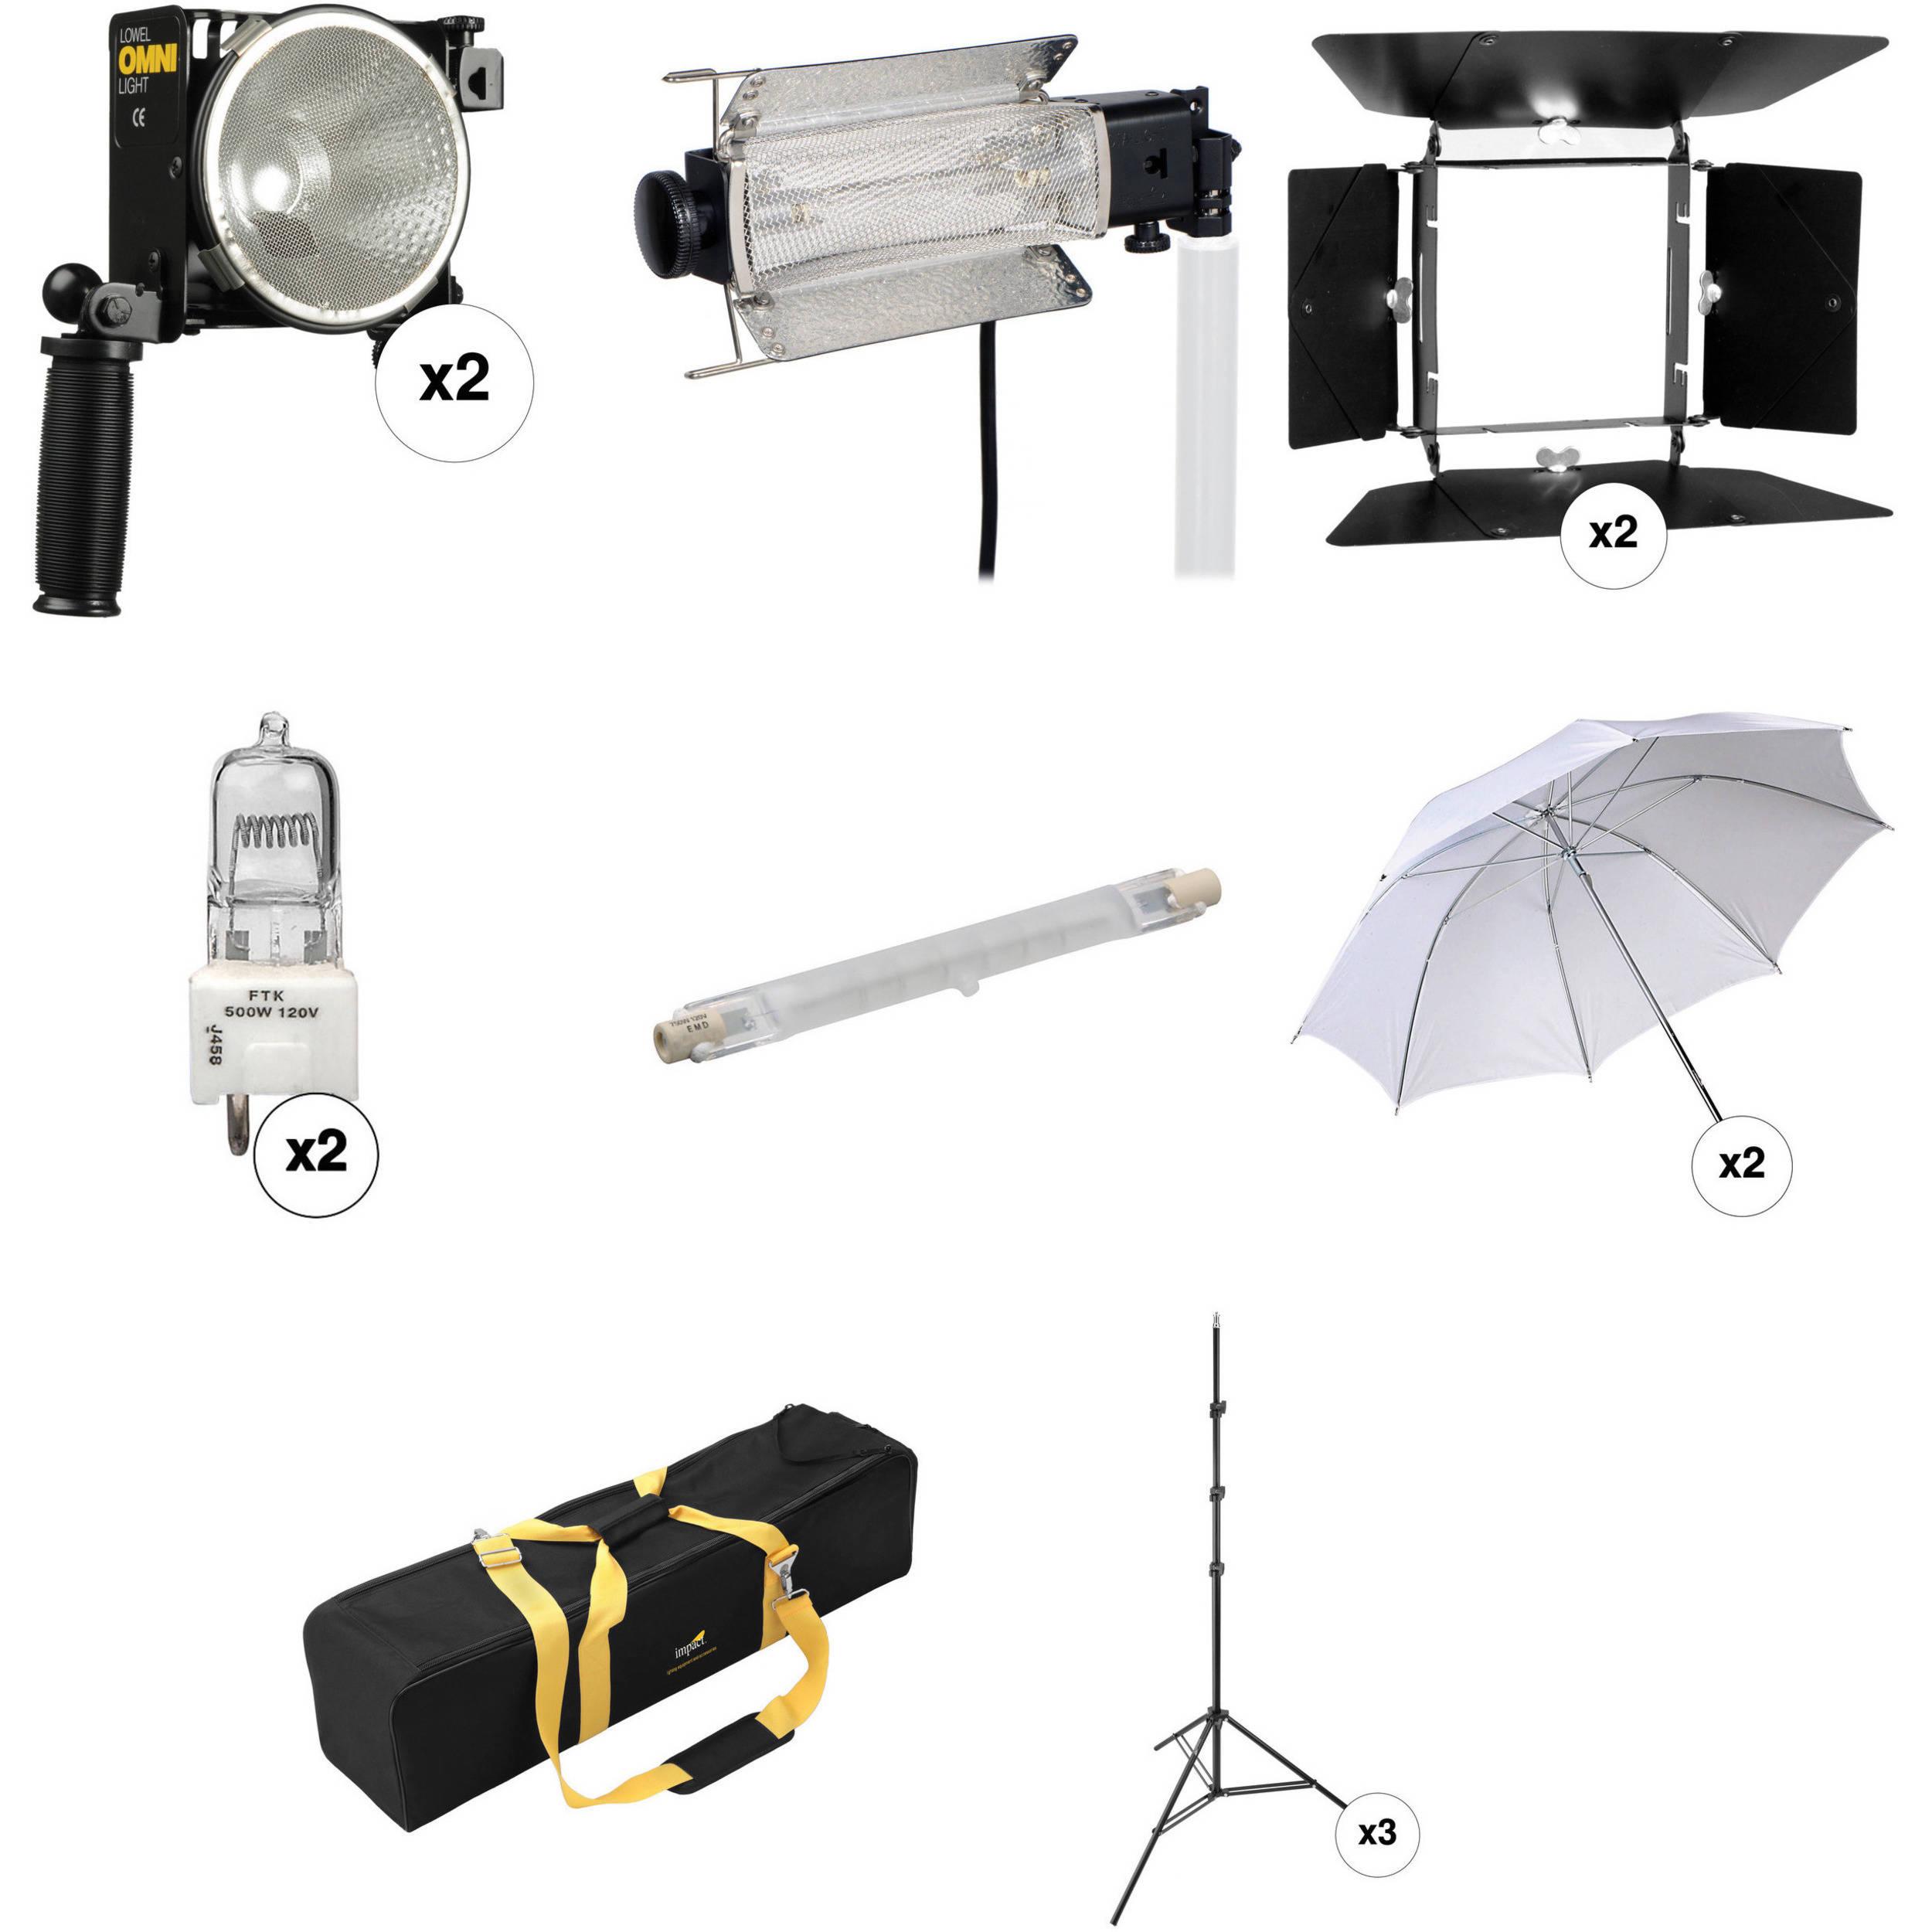 Lowel Lighting Kit Reviews